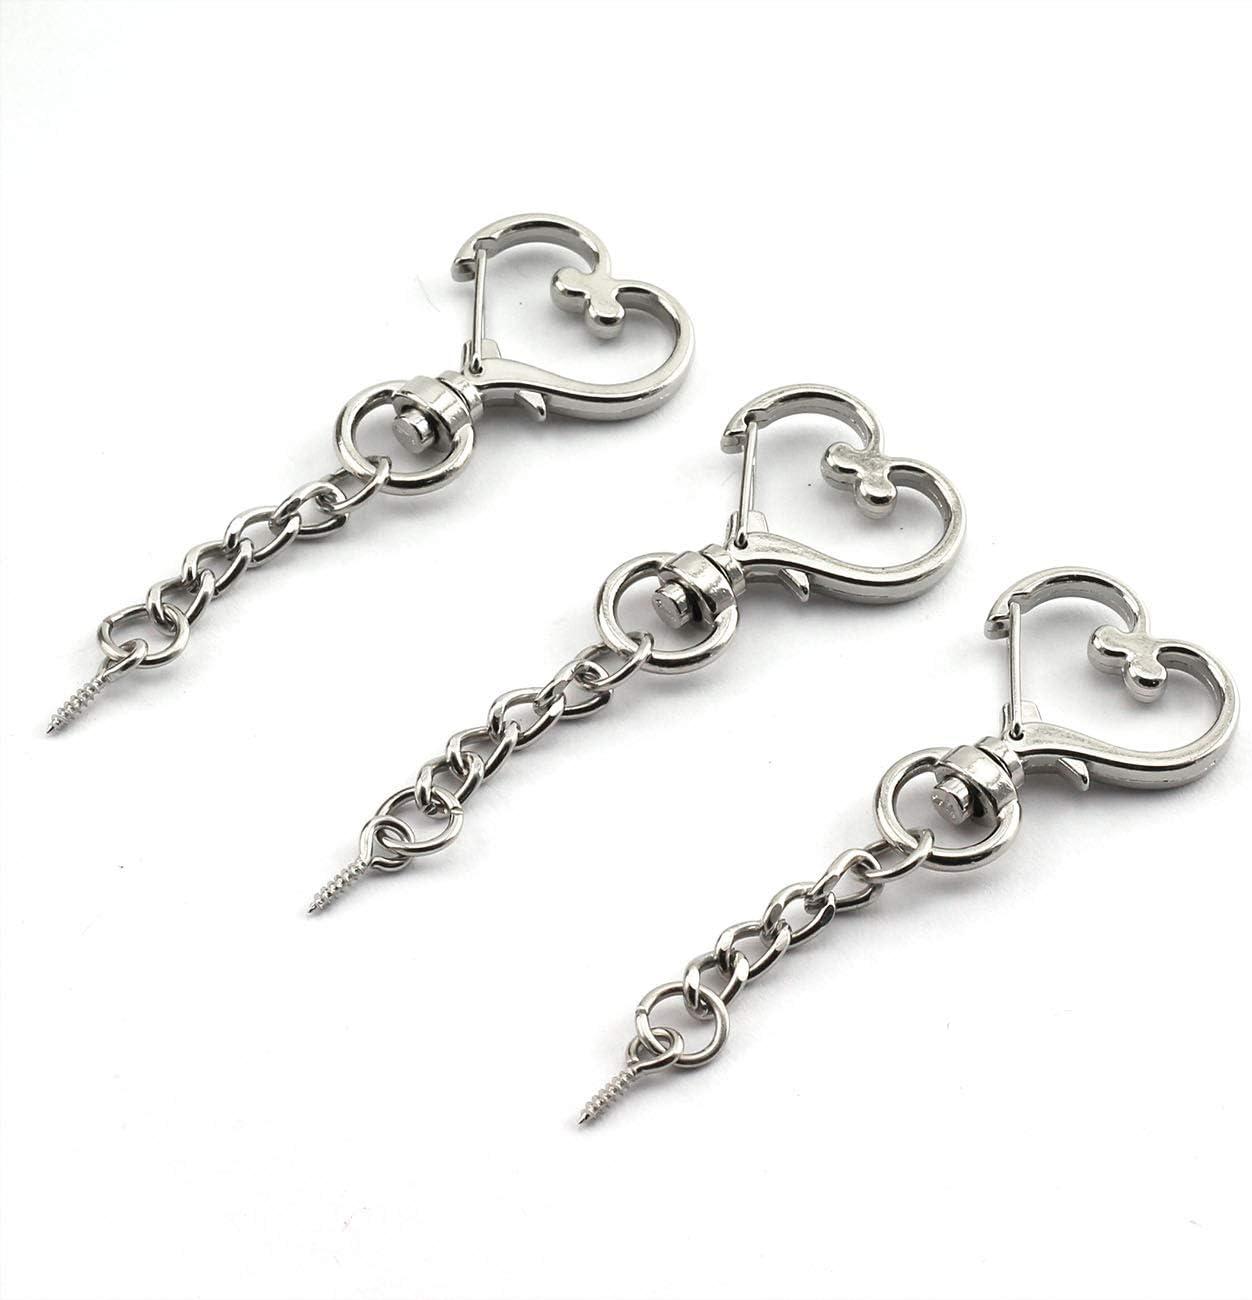 JCBIZ 20pcs Silver Heart Design Spring Snap Keychain Clip Zinc Alloy DIY Key Chains Accessories Creative Pentagram Hanging Buckle